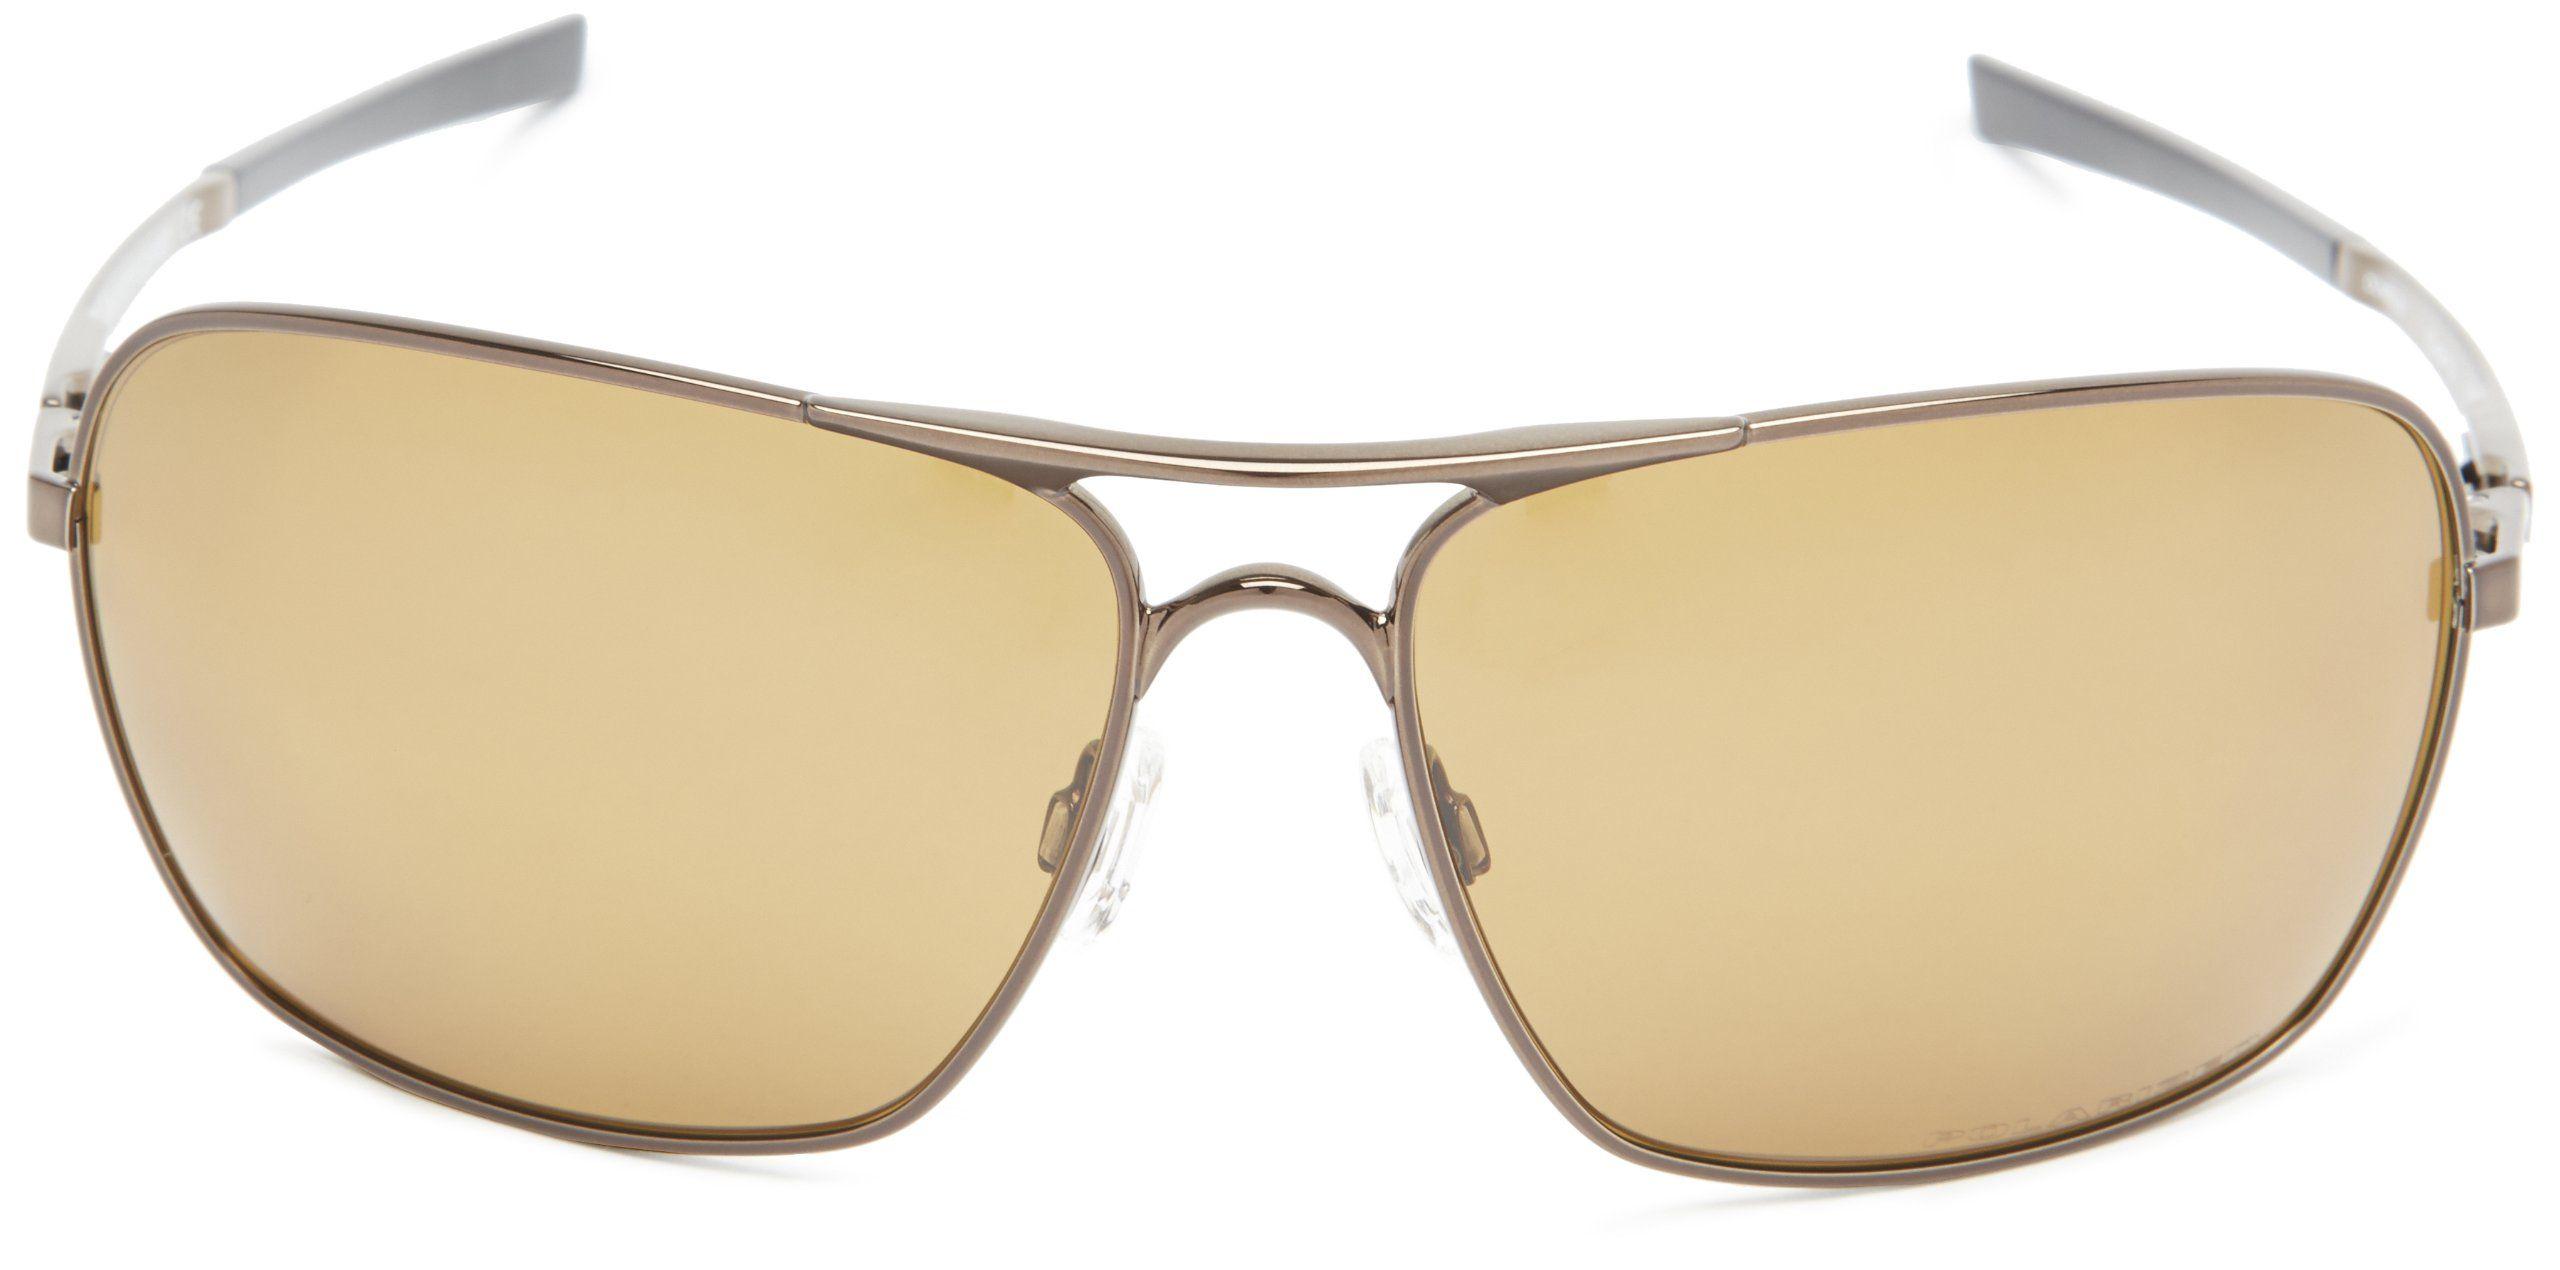 b15390ab79e1c Oakley Polarized Plaintiff Squared Sunglasses Matte Black « One More ...